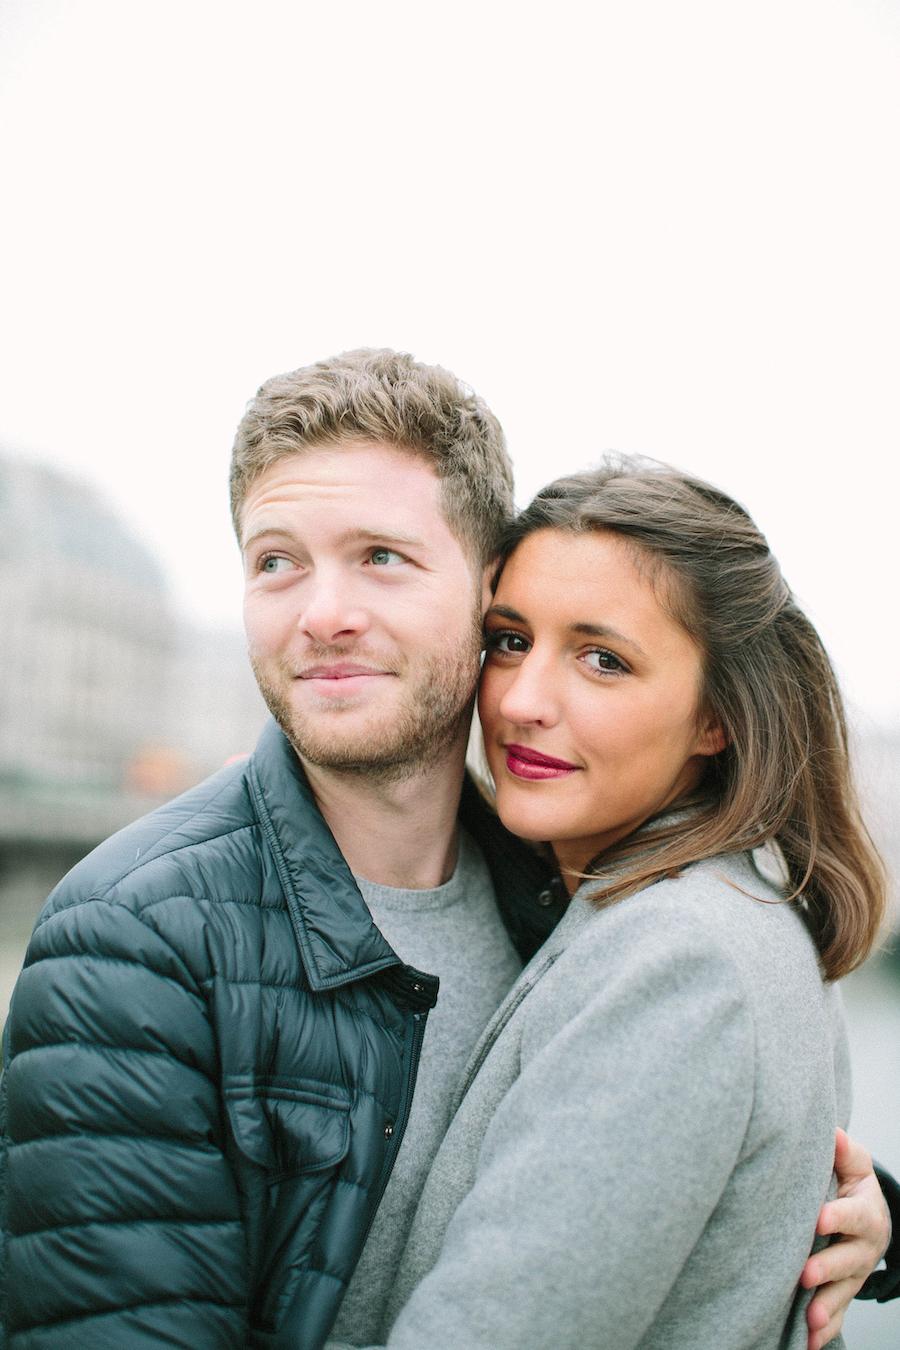 saya-photography-pre-wedding-couple-engagement-paris-quartier-latin-13.jpg